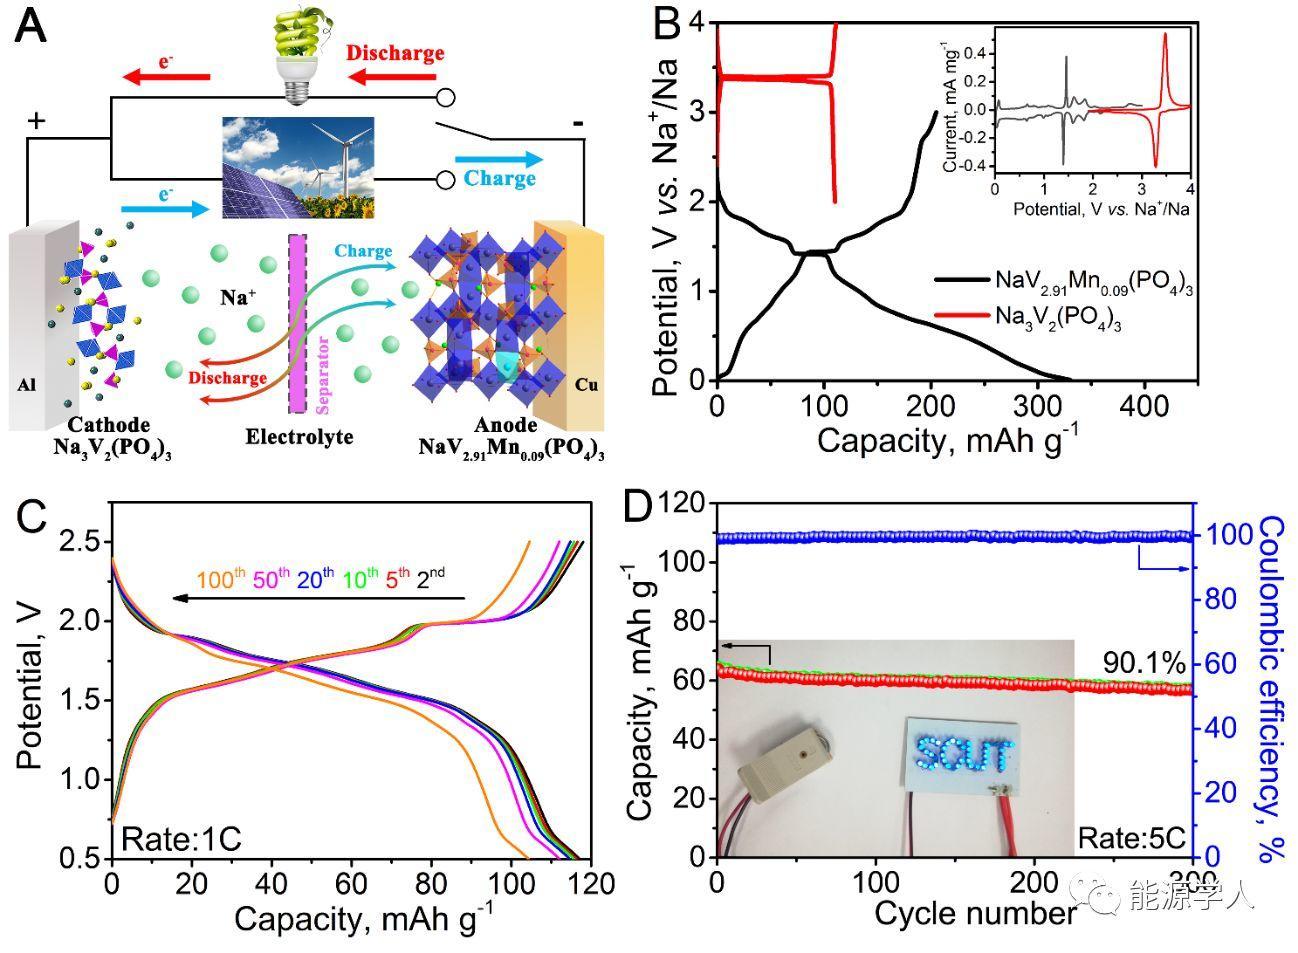 Mn掺杂NaV3(PO4)3用于大倍率和长循环钠离子电池负极材料